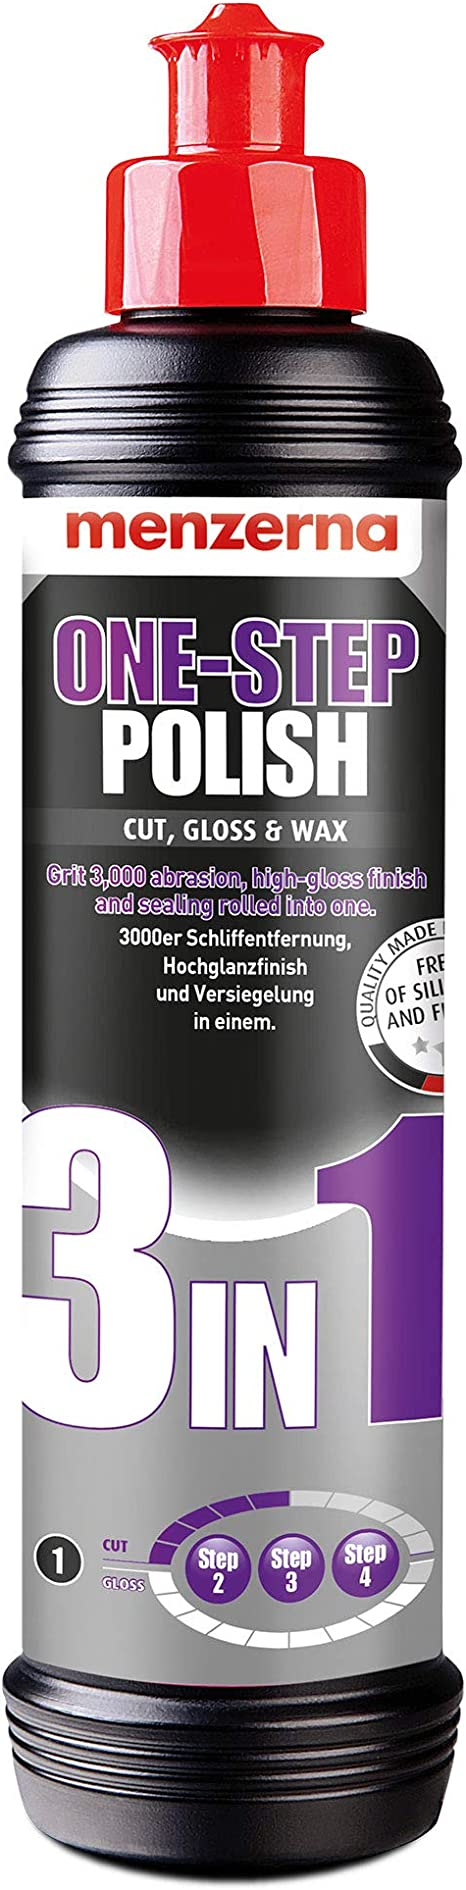 Amazon Fr Menzerna One Step Polish Cut Pâte à Polir 3 En 1 Gloss Wax 250 Ml